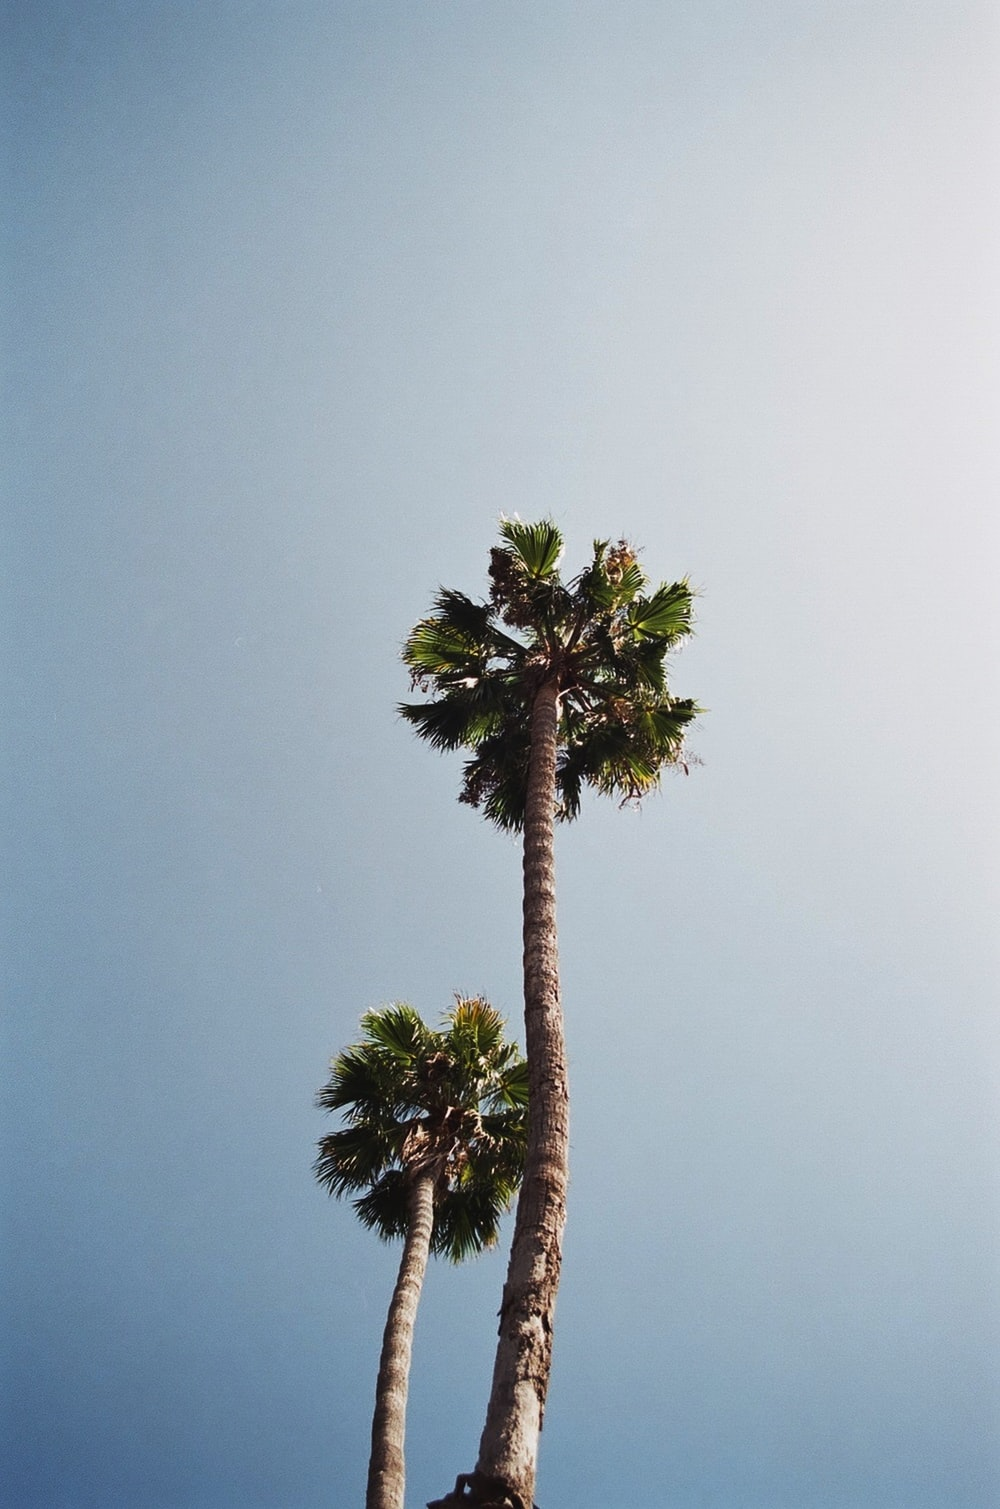 green palm tree under gray sky